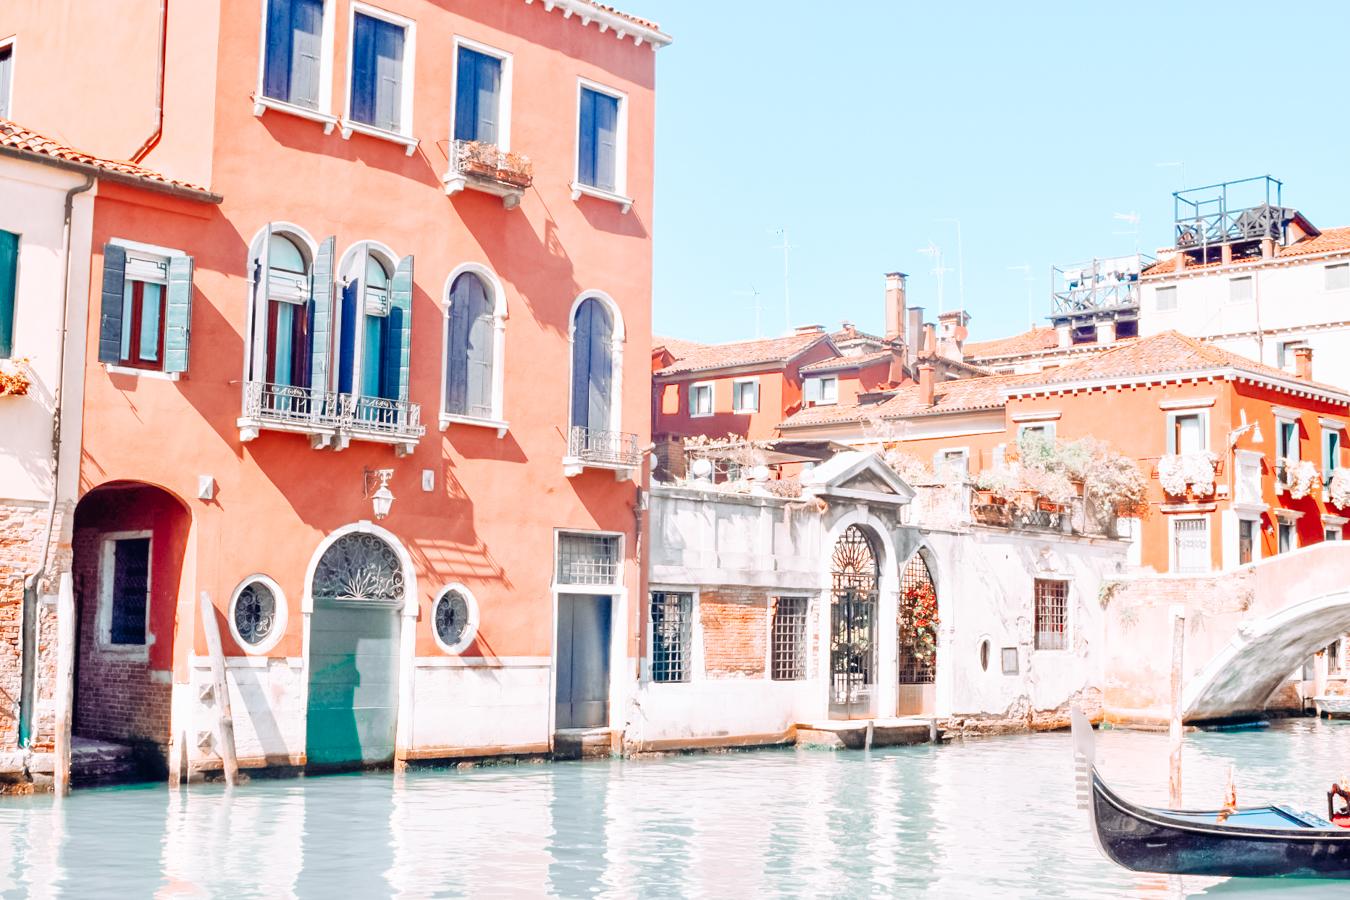 Orange buildings and water in Venice